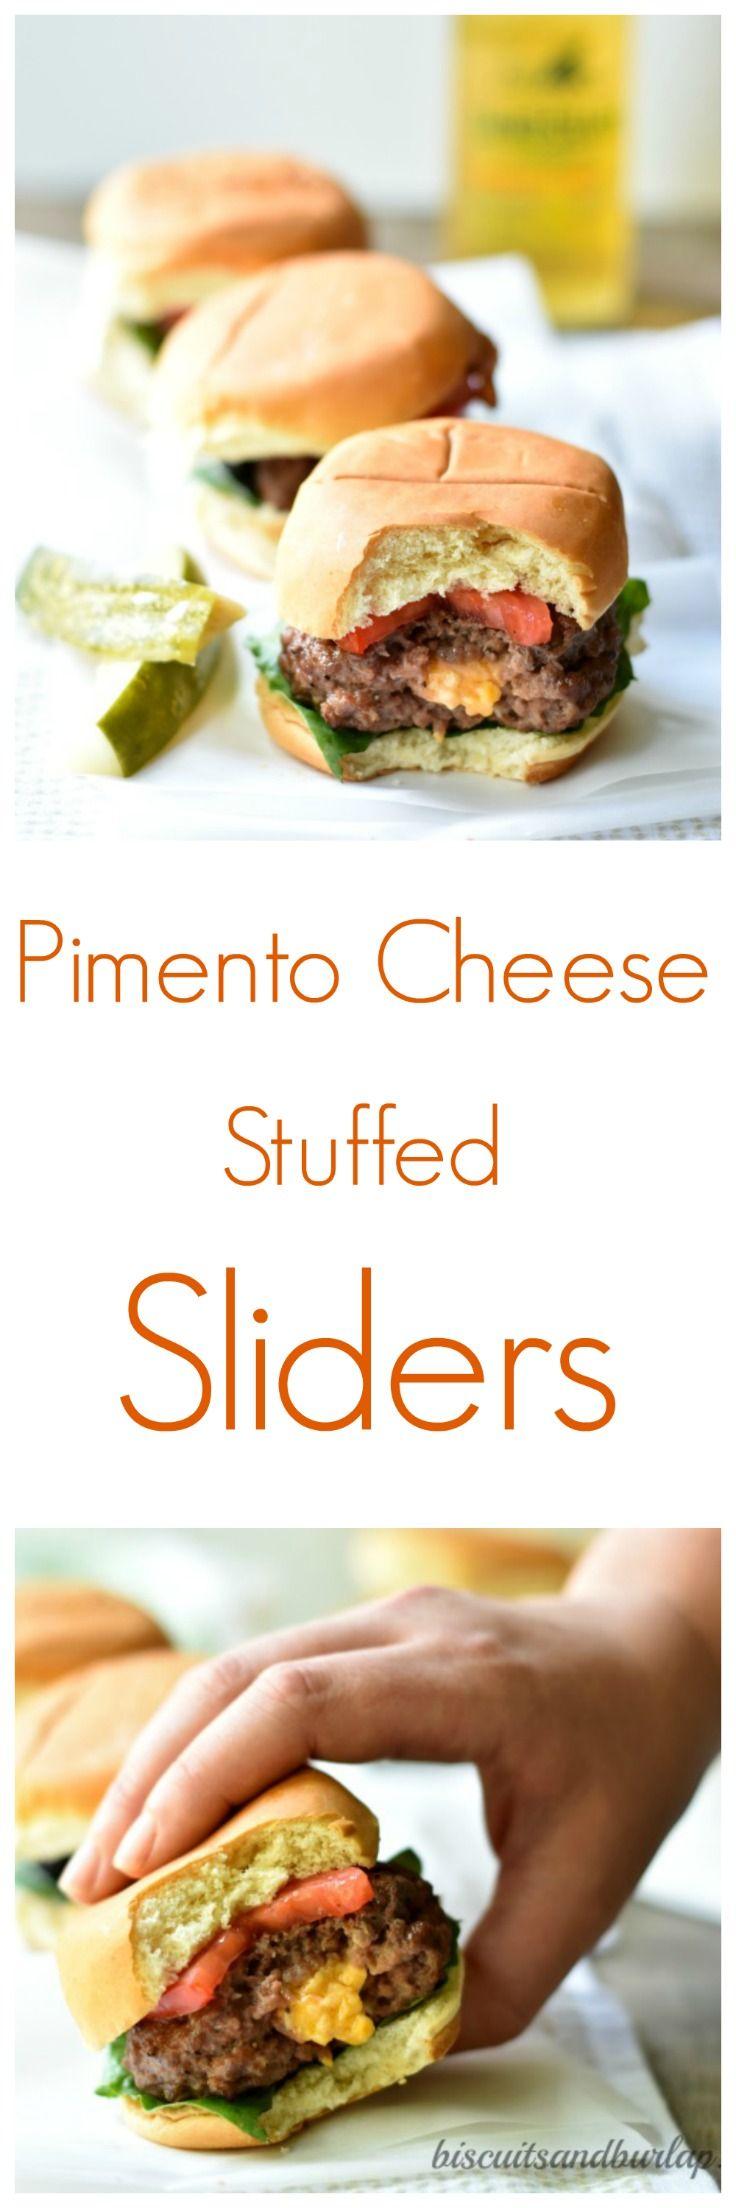 Pimento Cheese-Stuffed Sliders #tailgatefood